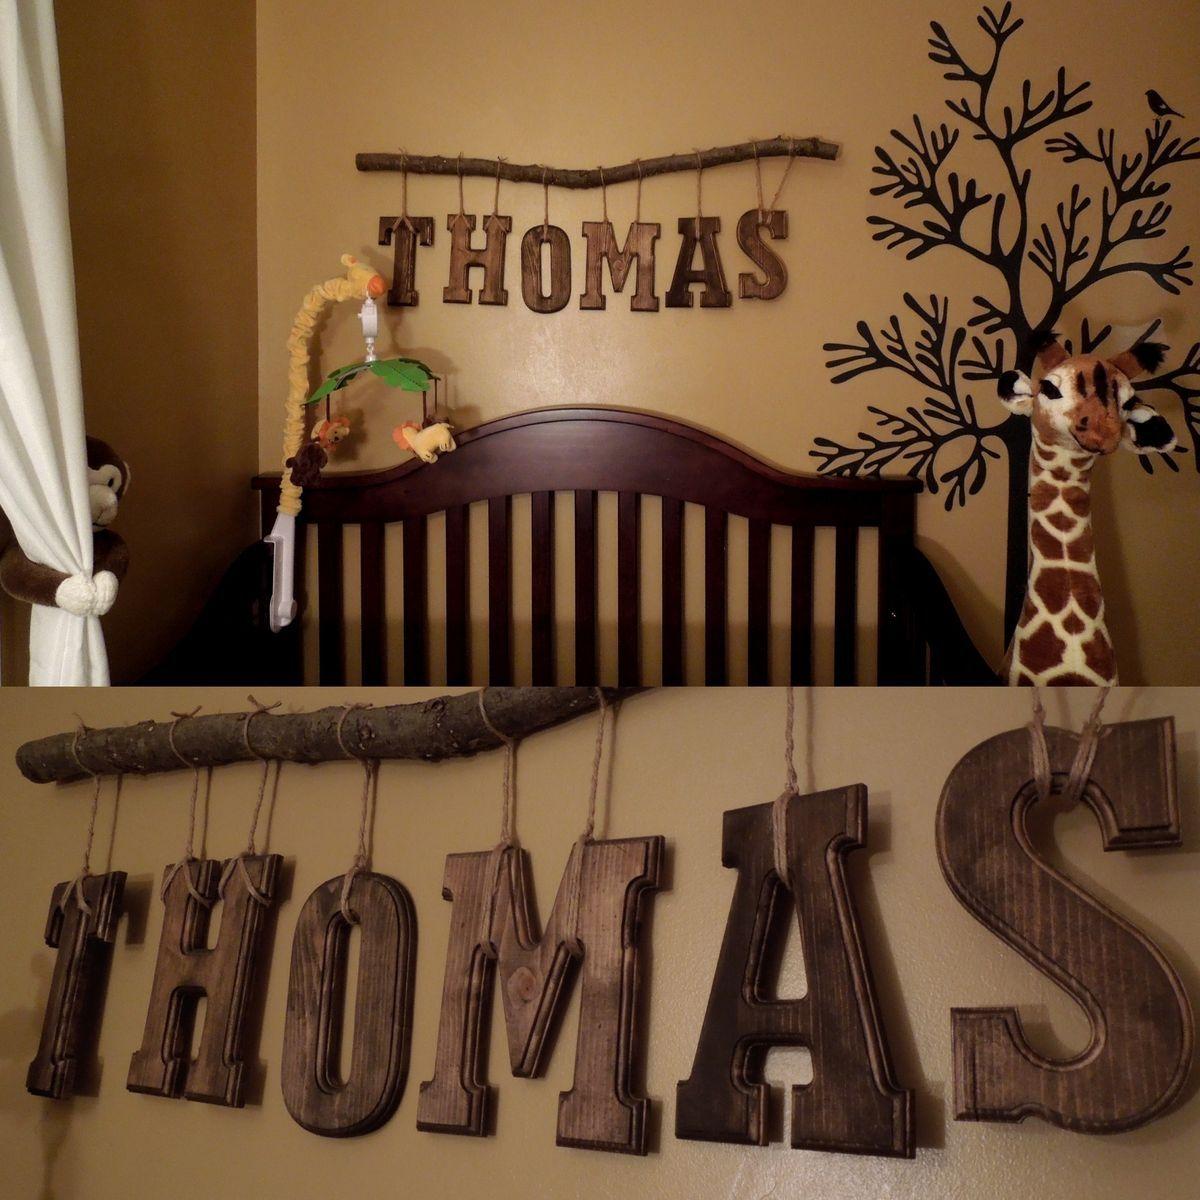 for the little hunter love these for a kids bedroom dakota a5e22f9ba71d600b59c61abfecdf6a41 jpg 1 200 1 200 pixeles